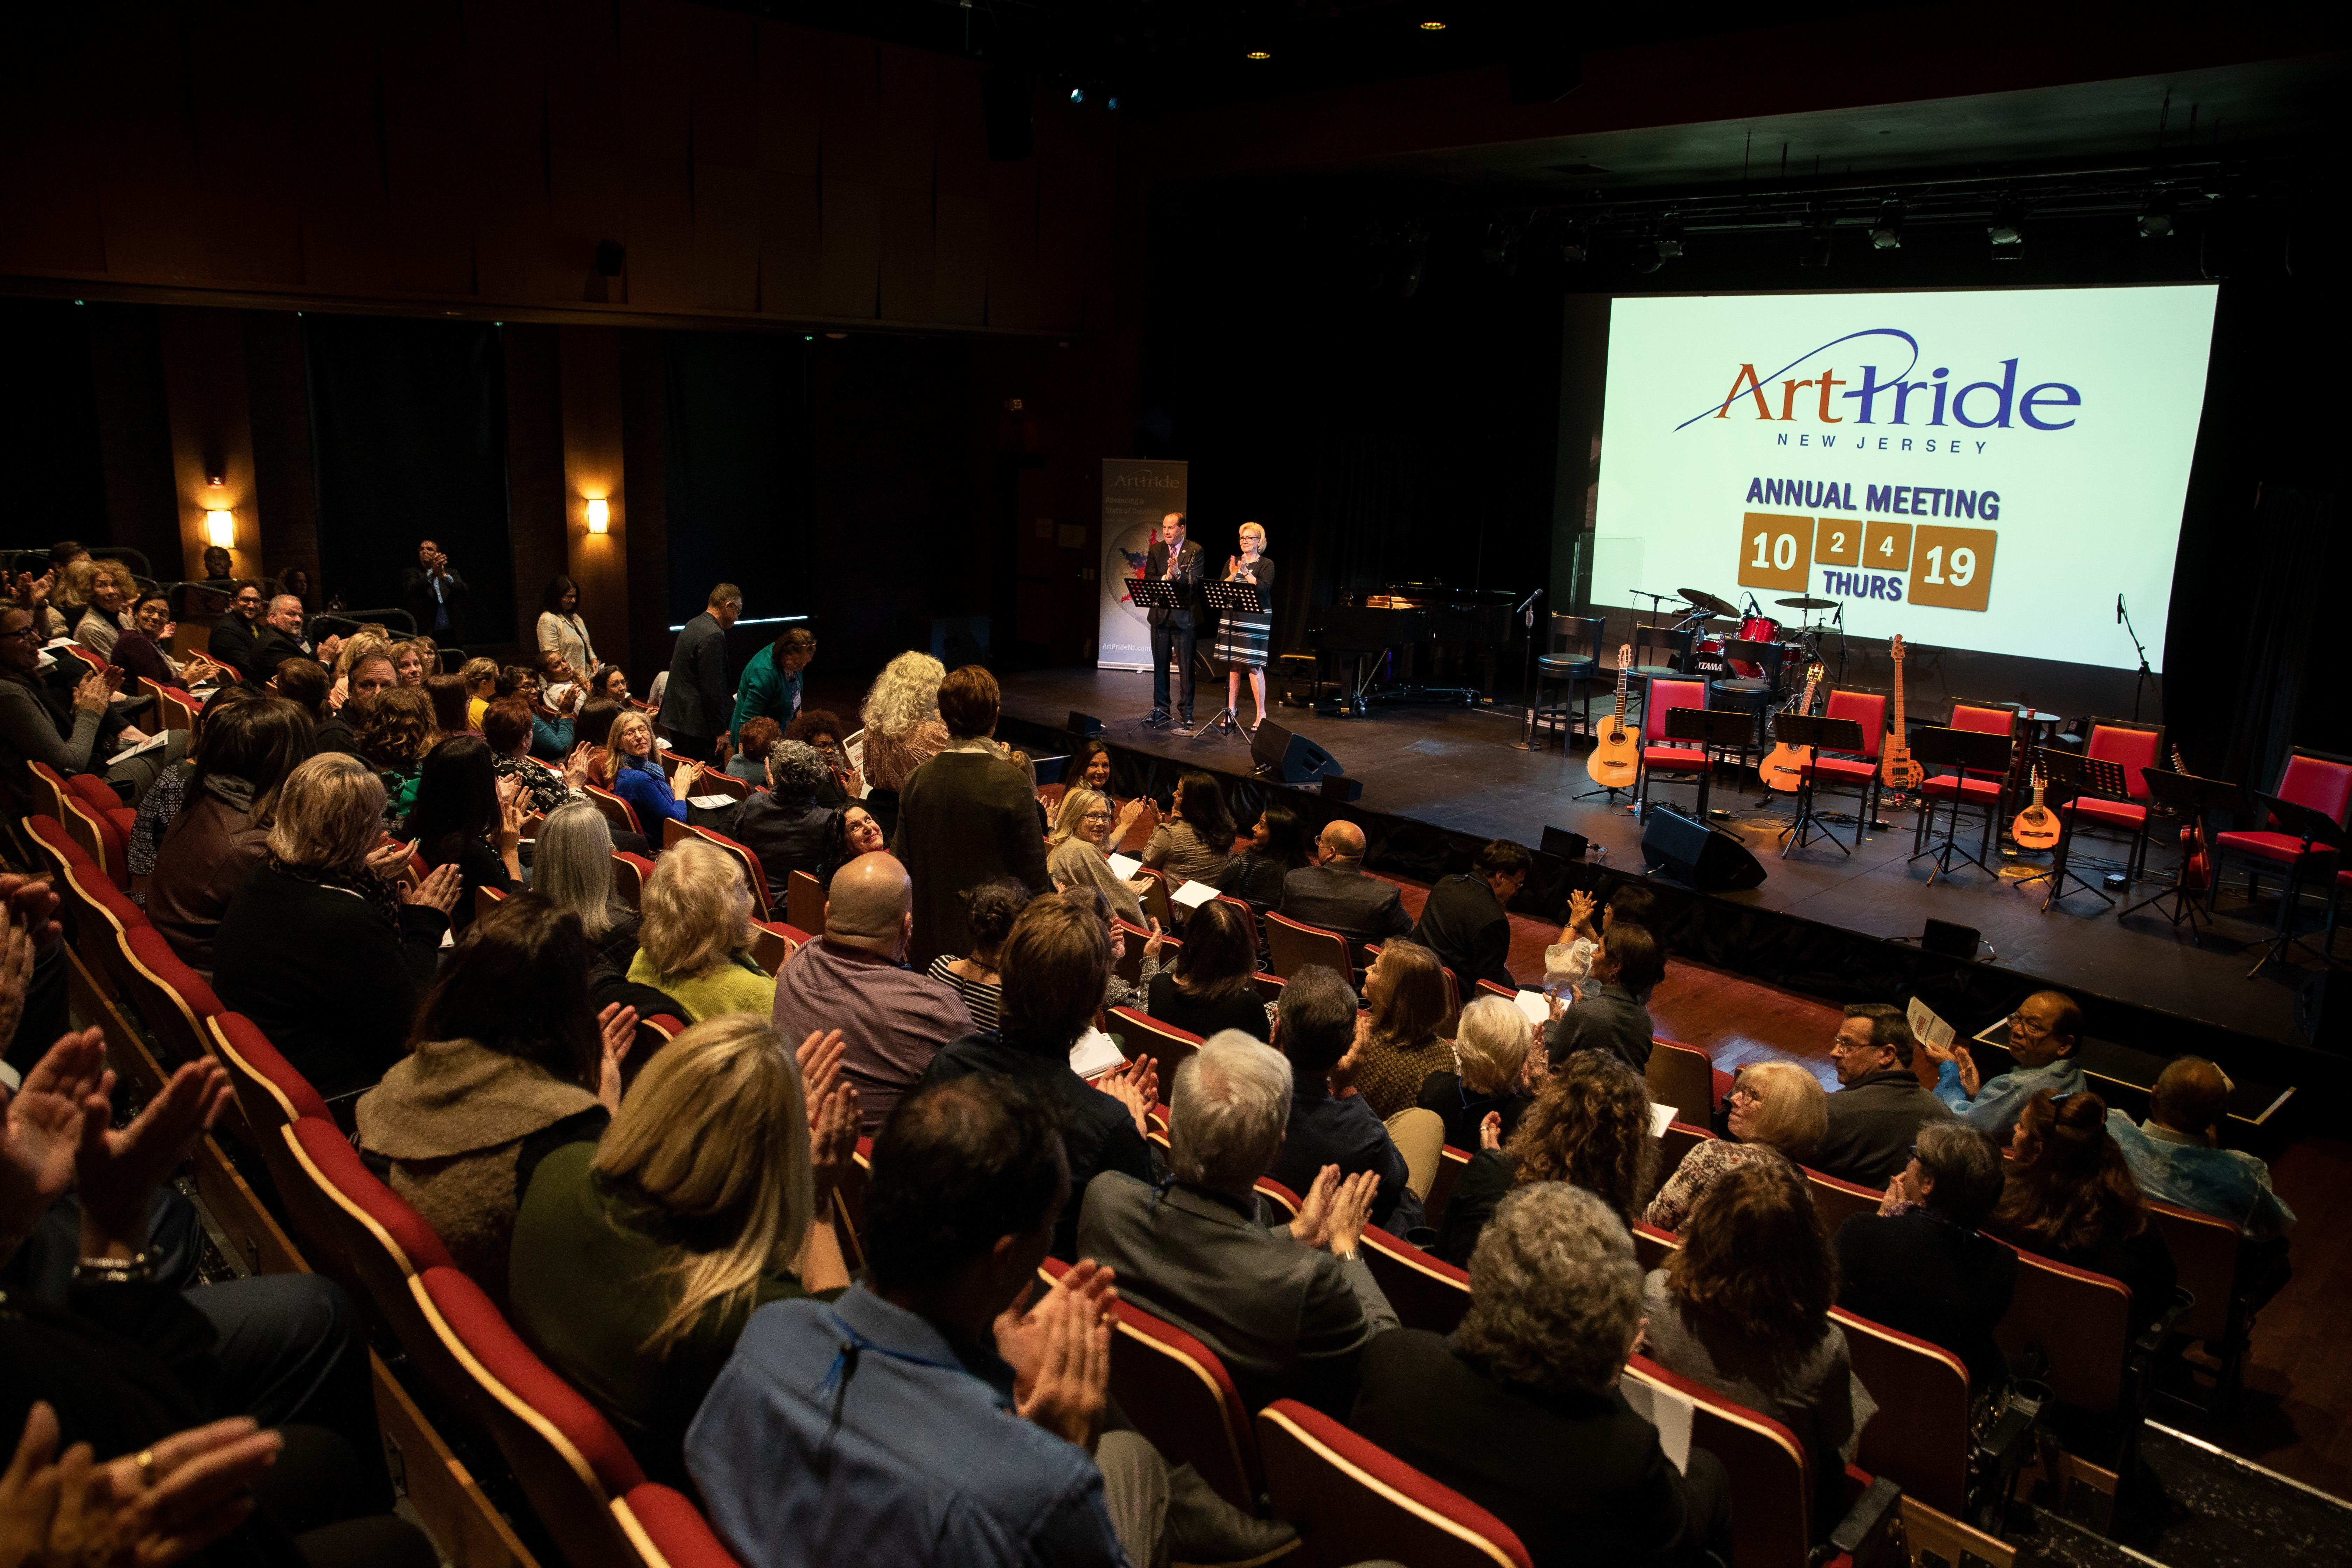 Celebrity Dining: The 2019 membership meeting of ArtPride, a Burlington County-based arts organization.